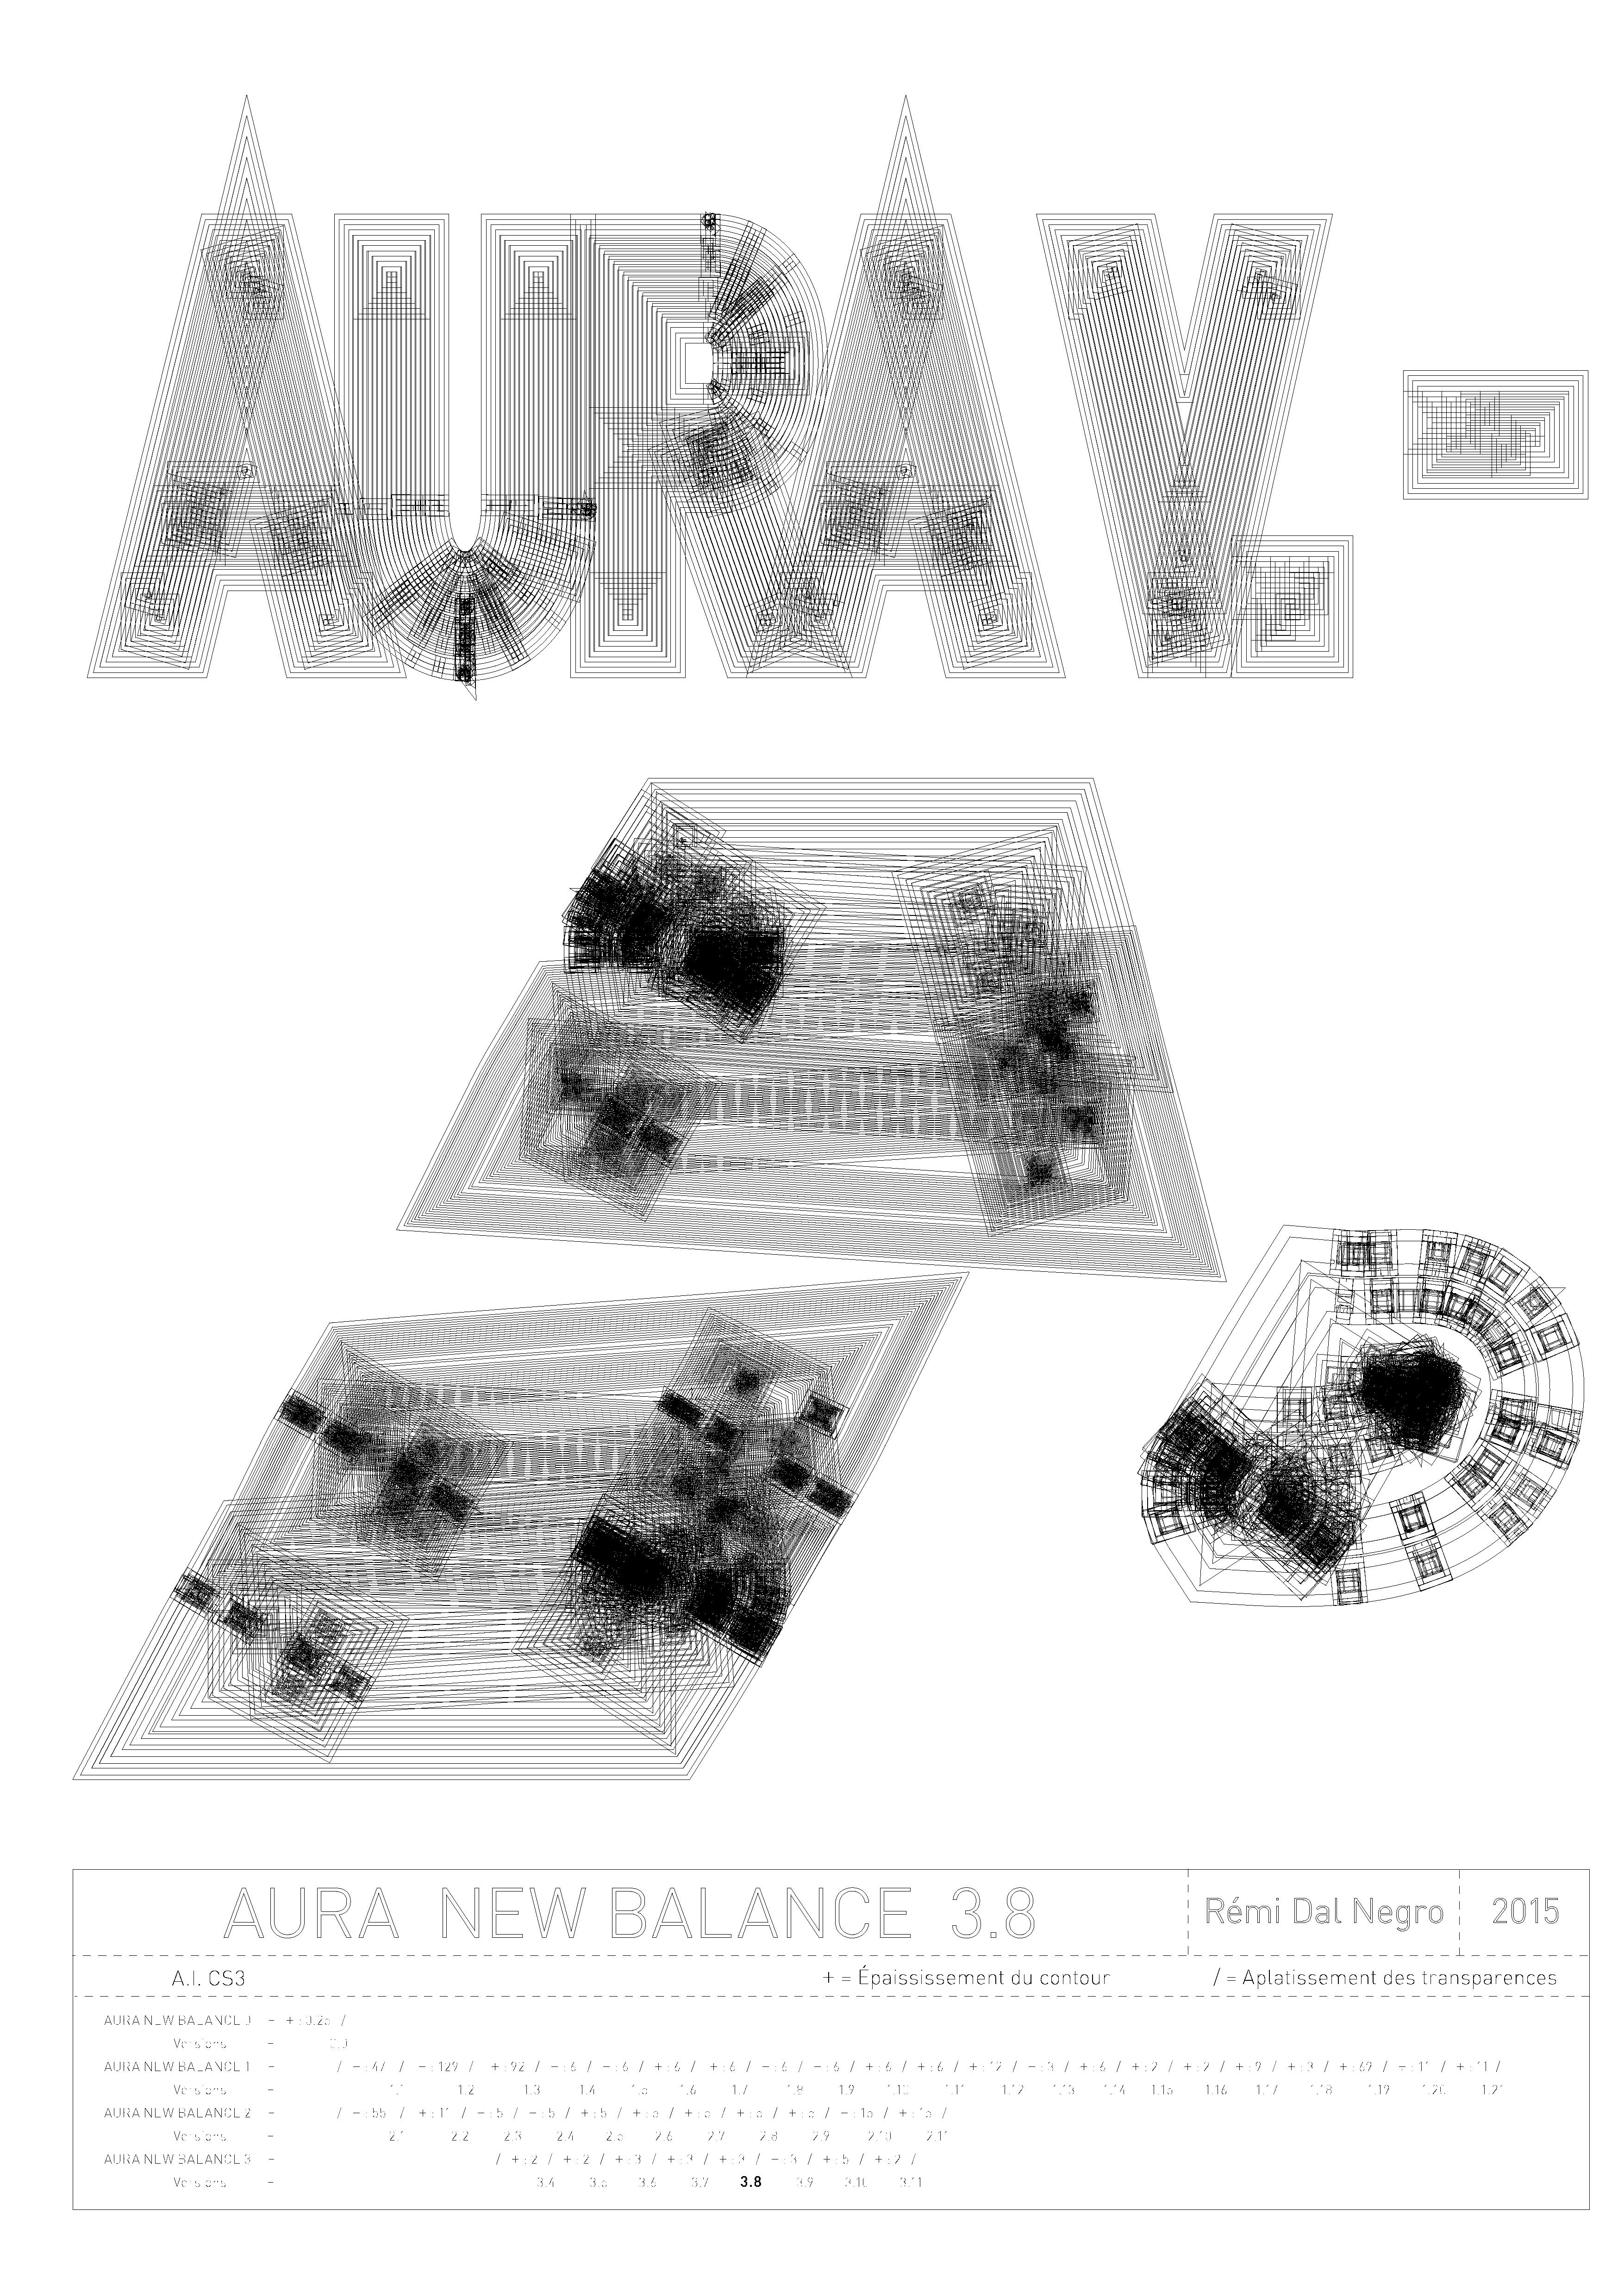 P1 – NEW BALANCE 3.6 – FACE